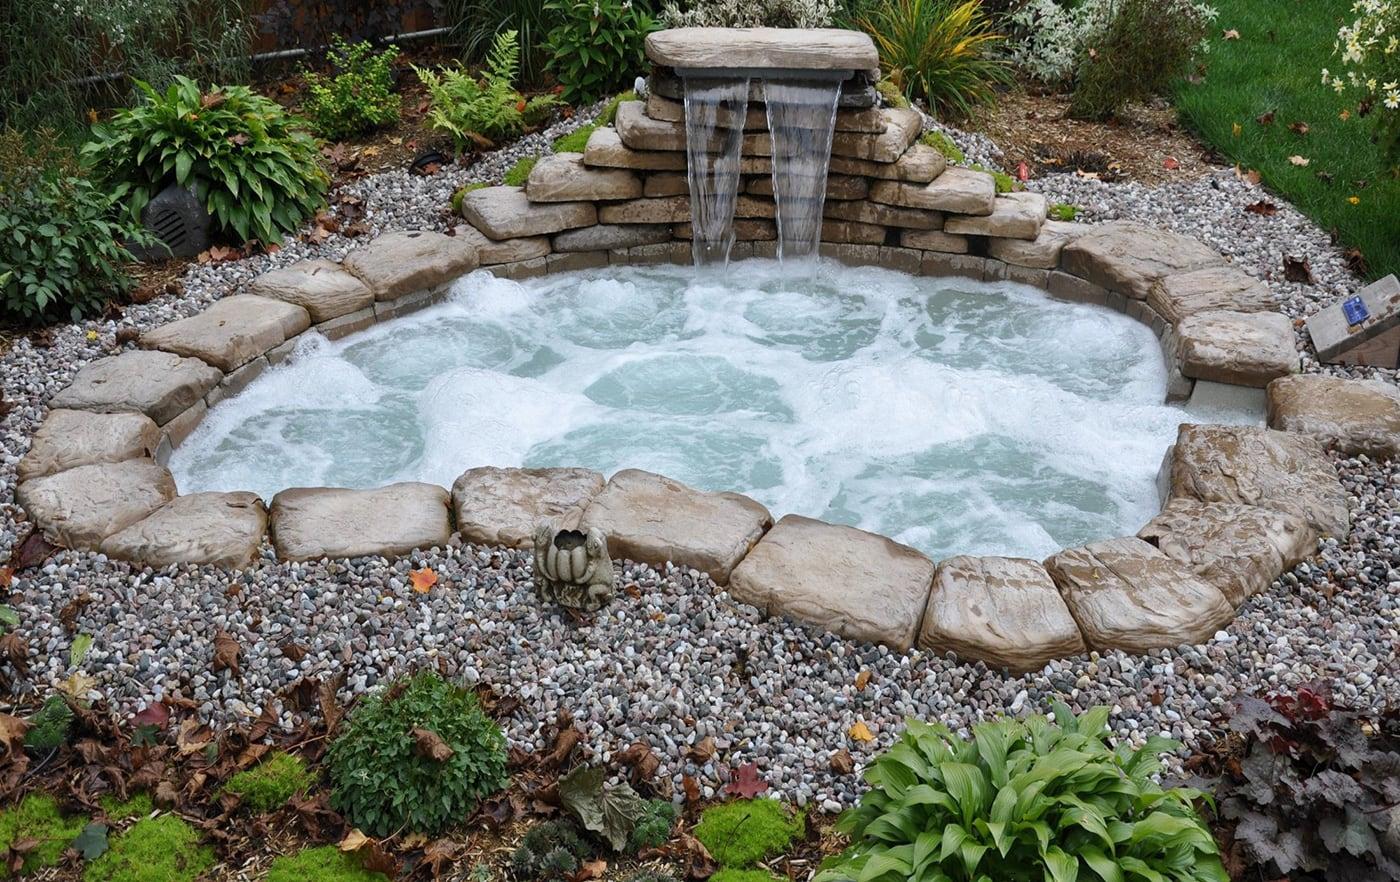 construction piscine aix en provence spa ext rieur 13 84 04. Black Bedroom Furniture Sets. Home Design Ideas